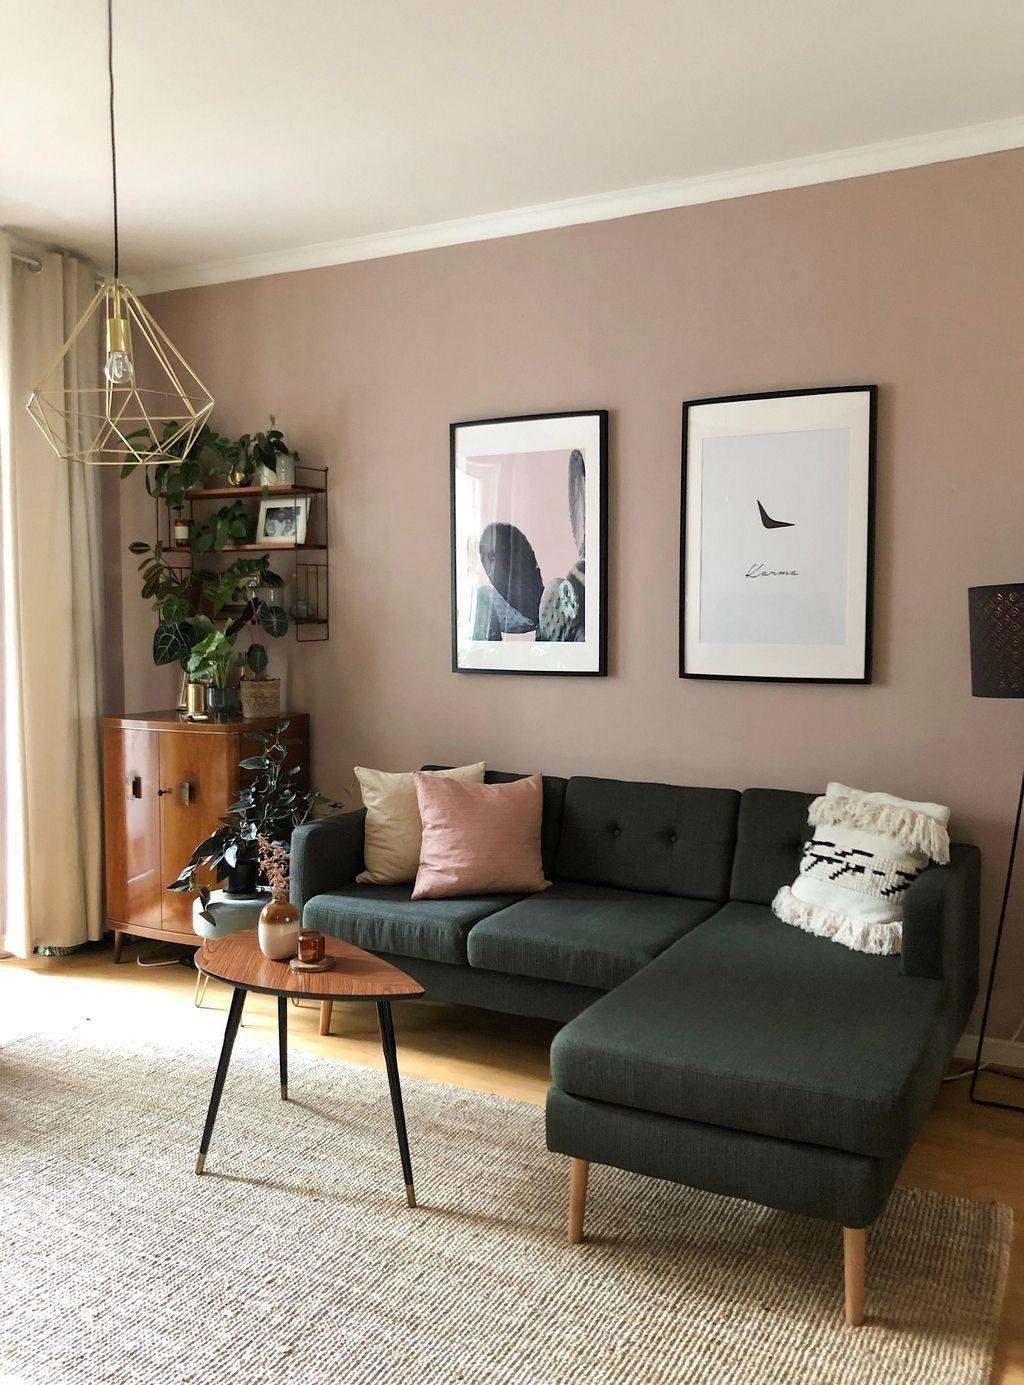 Living room decor ideas, remodeling inspiration, interior design ideas, remodeling inspiration,wall decor ideas,wall artworks inspiration #livingroom #livingroomideas #wallartdecor